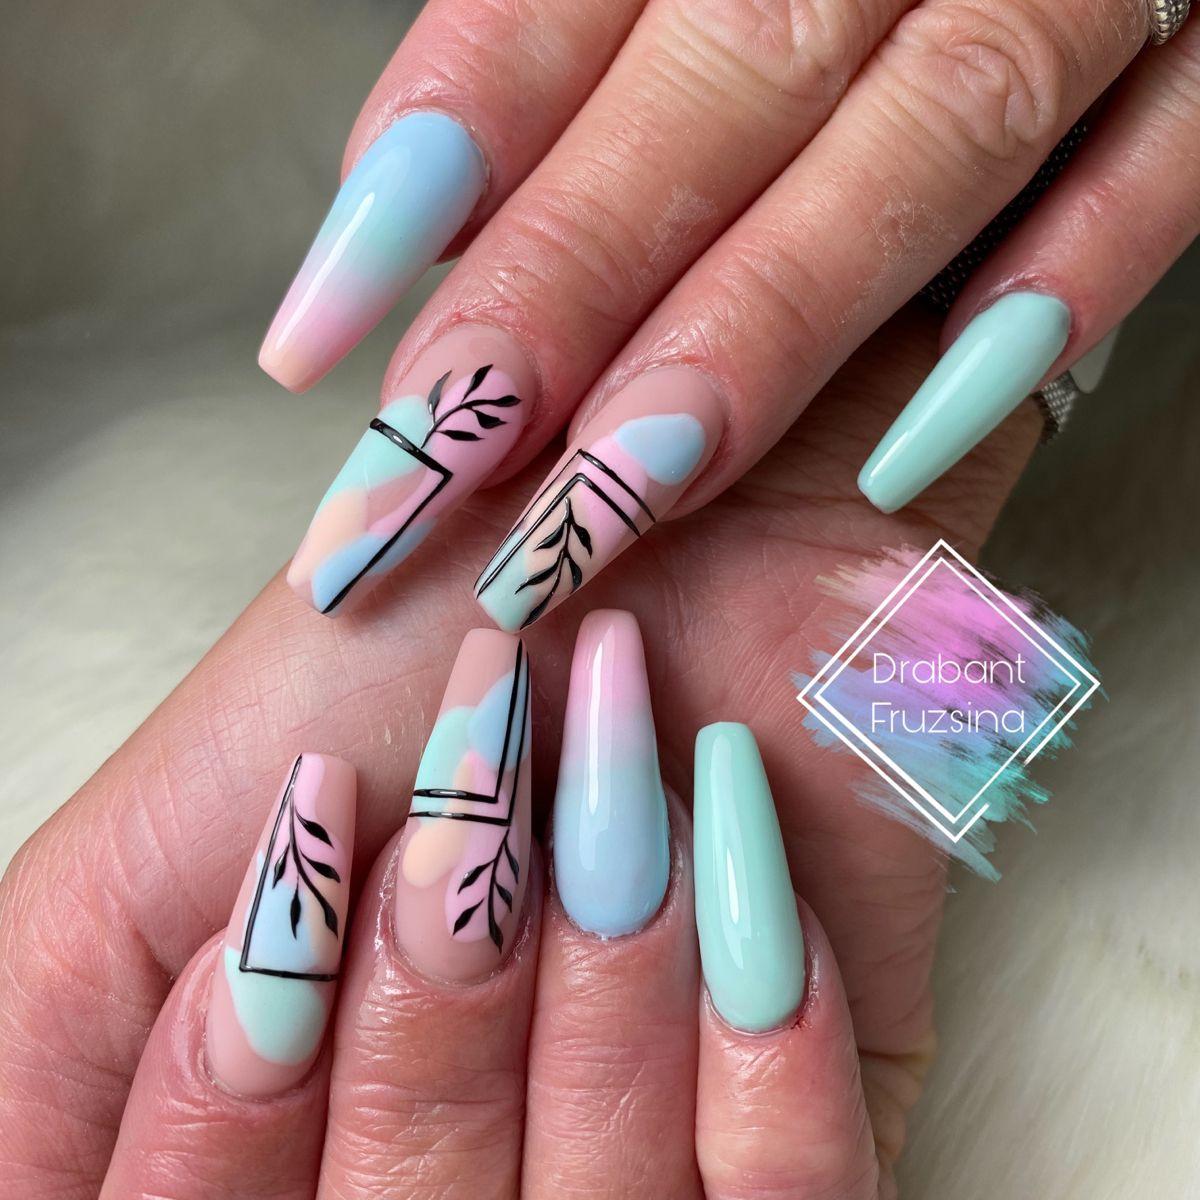 #pastelnails #pastel #ballerina #ballerinanails #mattenails #ombrenails #nails #nailart #summernails #balerina #mukorom #mukormos #perfectnails #cupcake